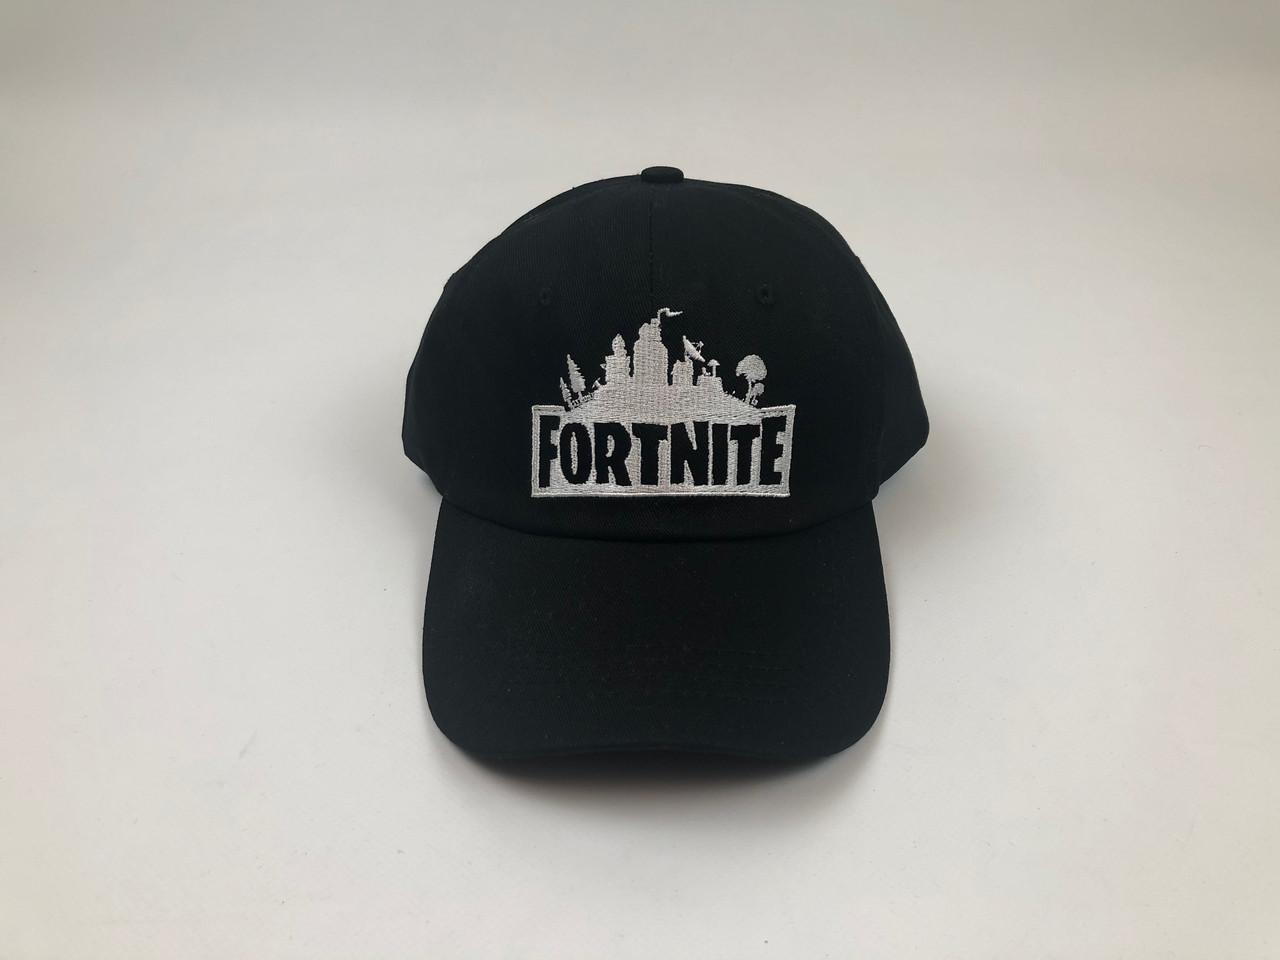 Кепка бейсболка - Fortnite (Черный)